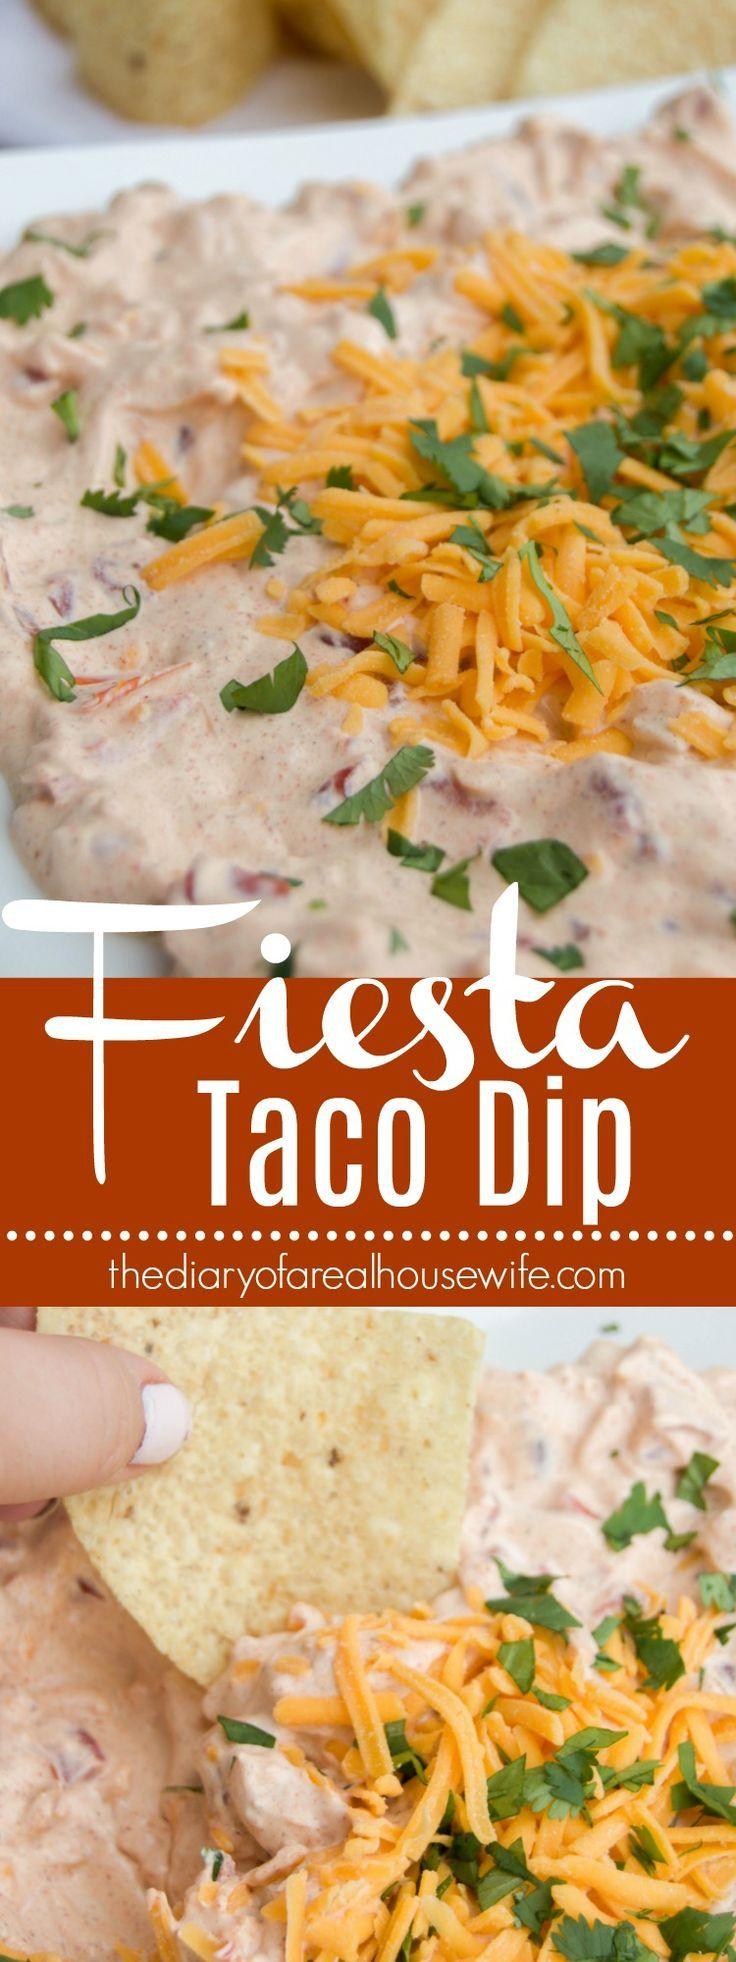 Fiesta Taco Dip